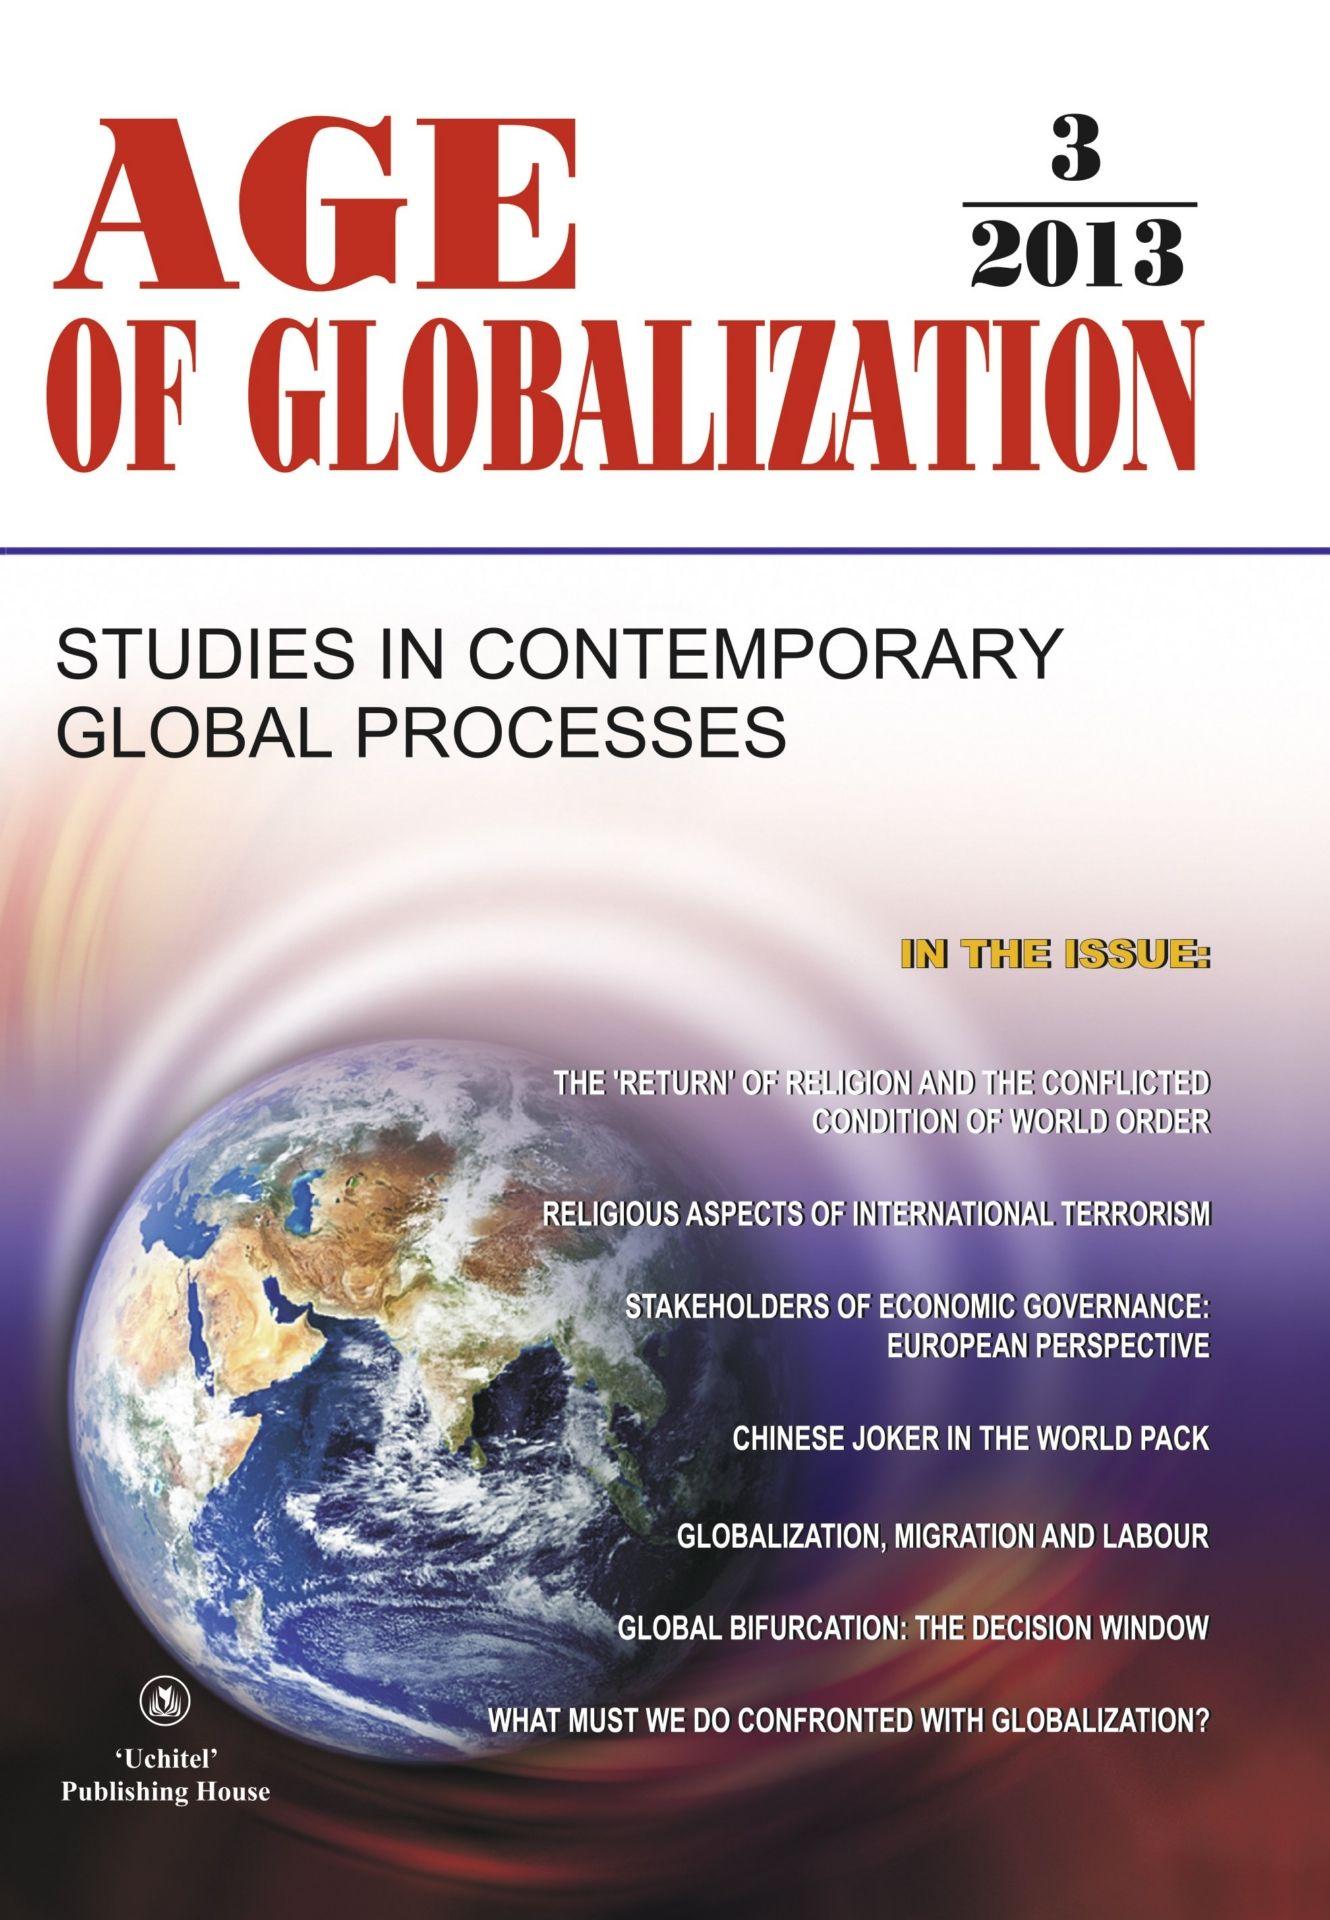 Age of Globalization. Век глобализации на английском языке. № 3 2013 г.